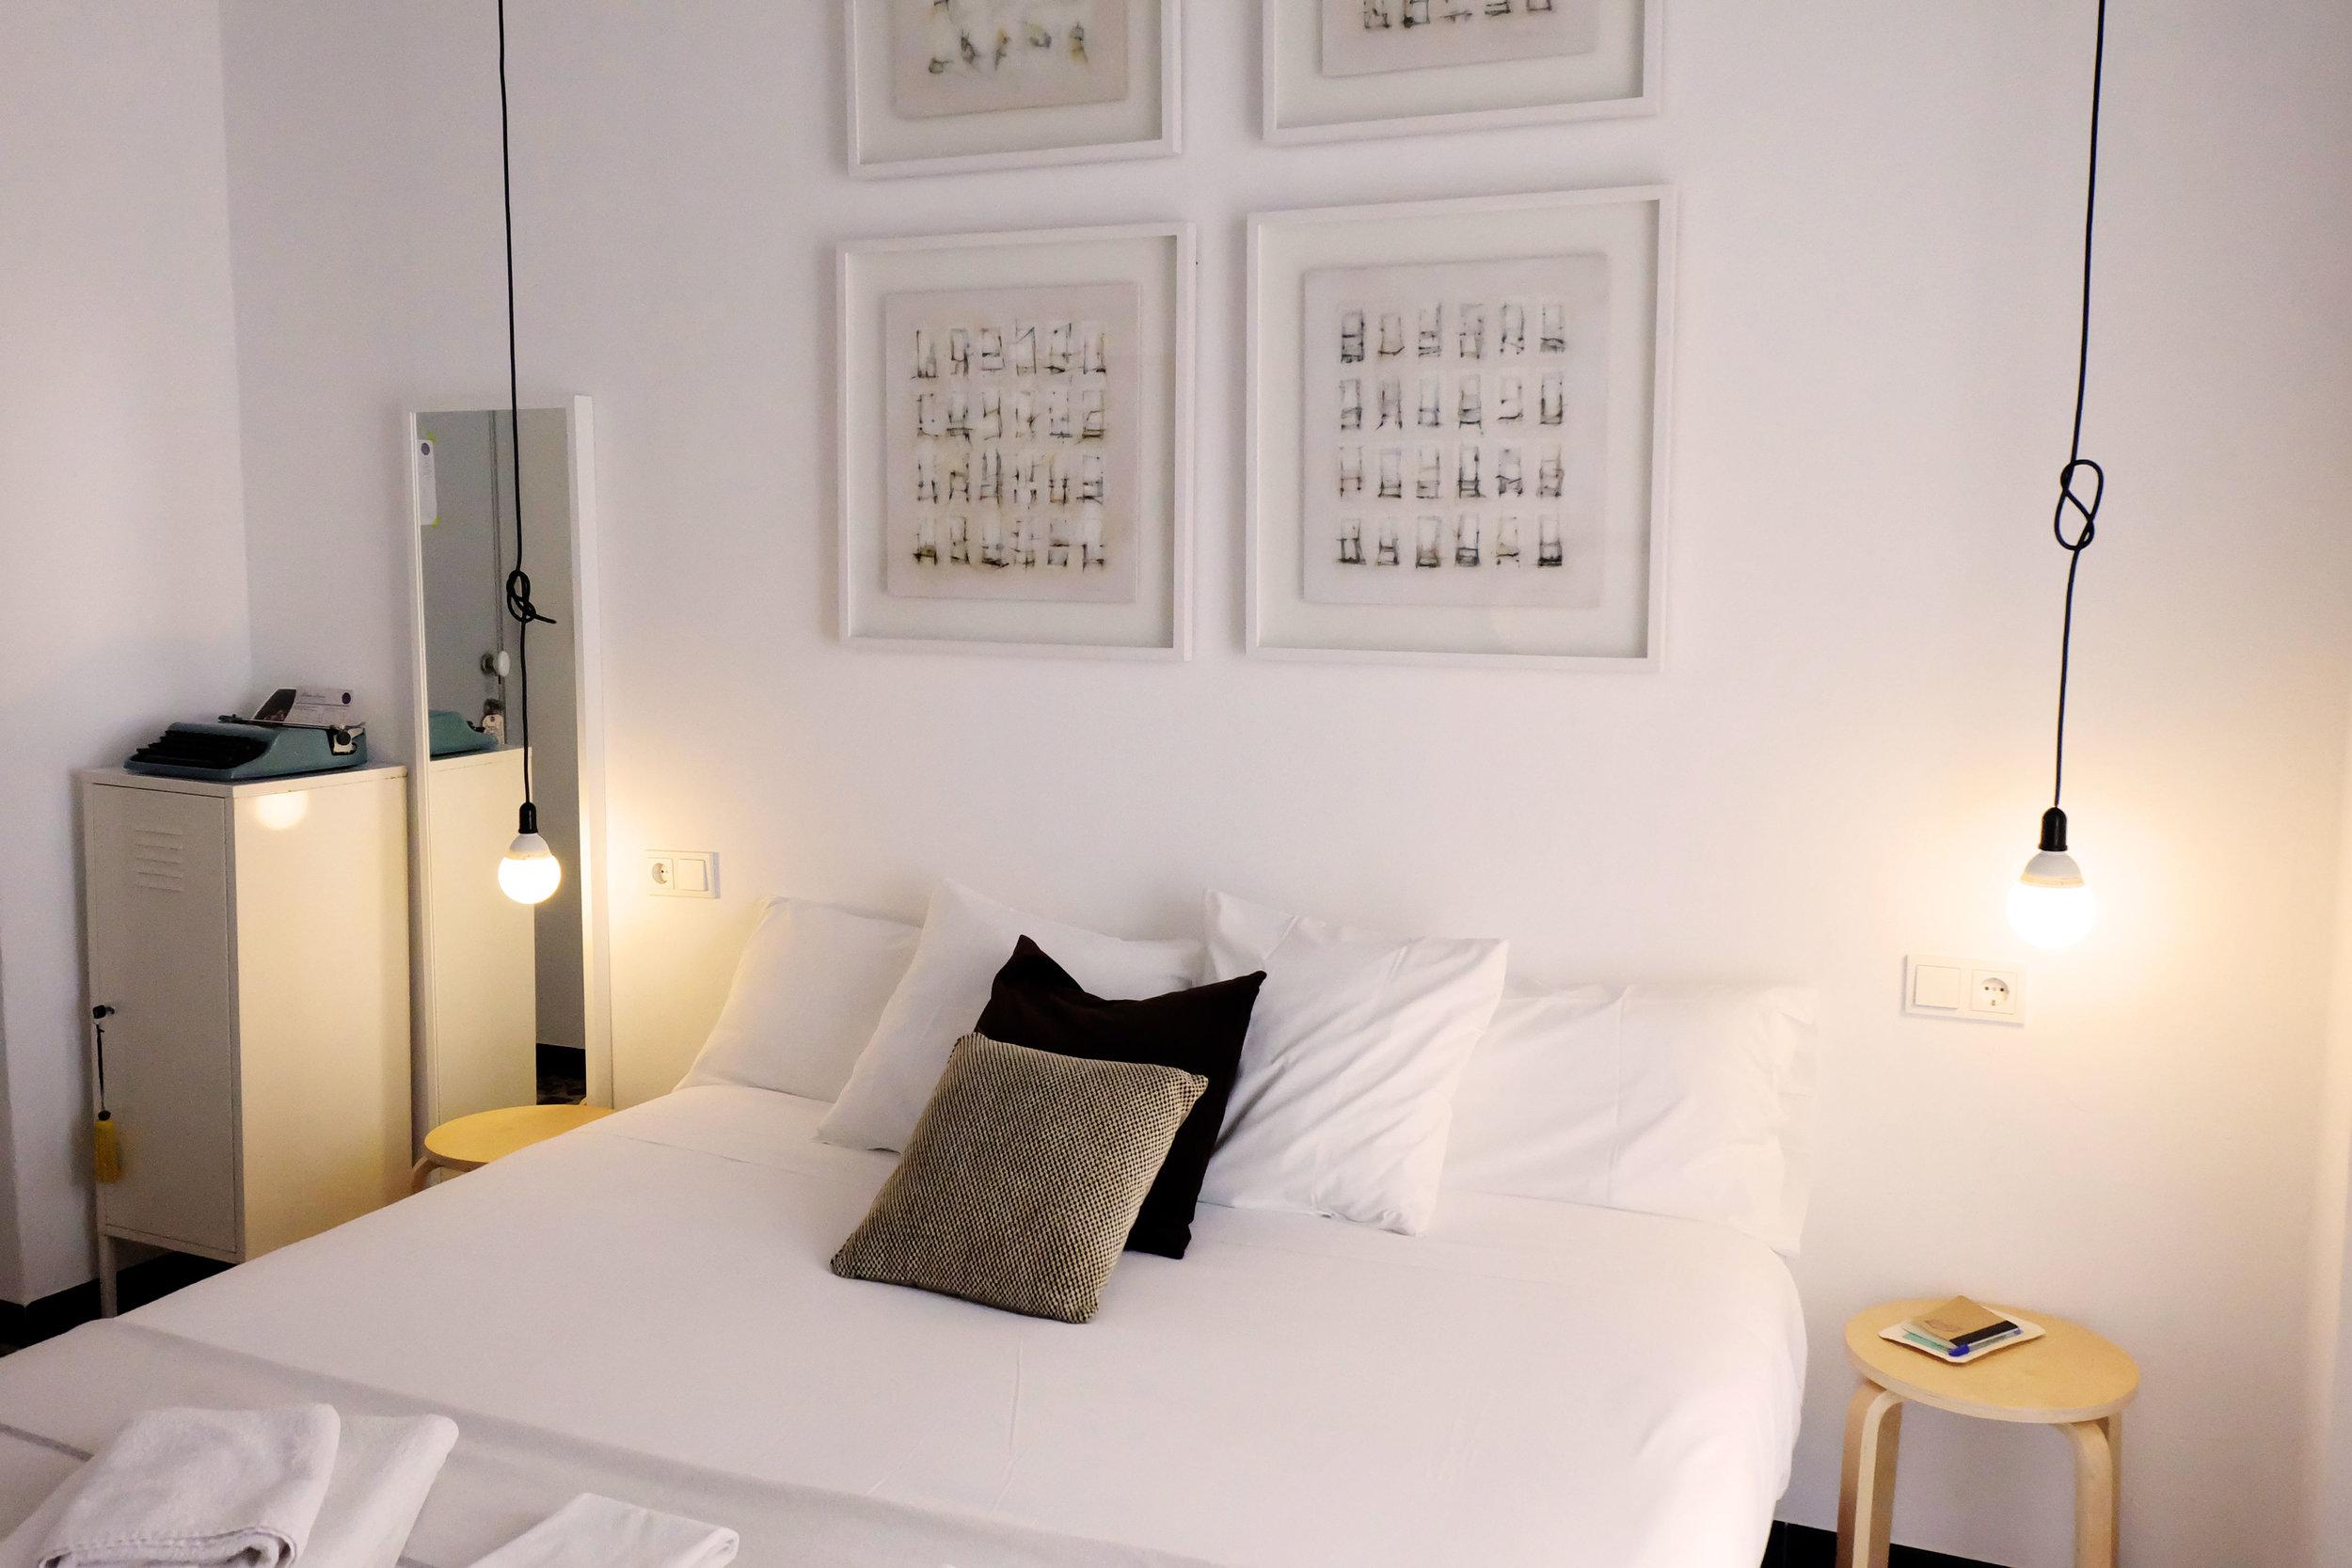 Hotel-Casa-de-huespedes-santa-maria-Habitacion-8-13.JPG